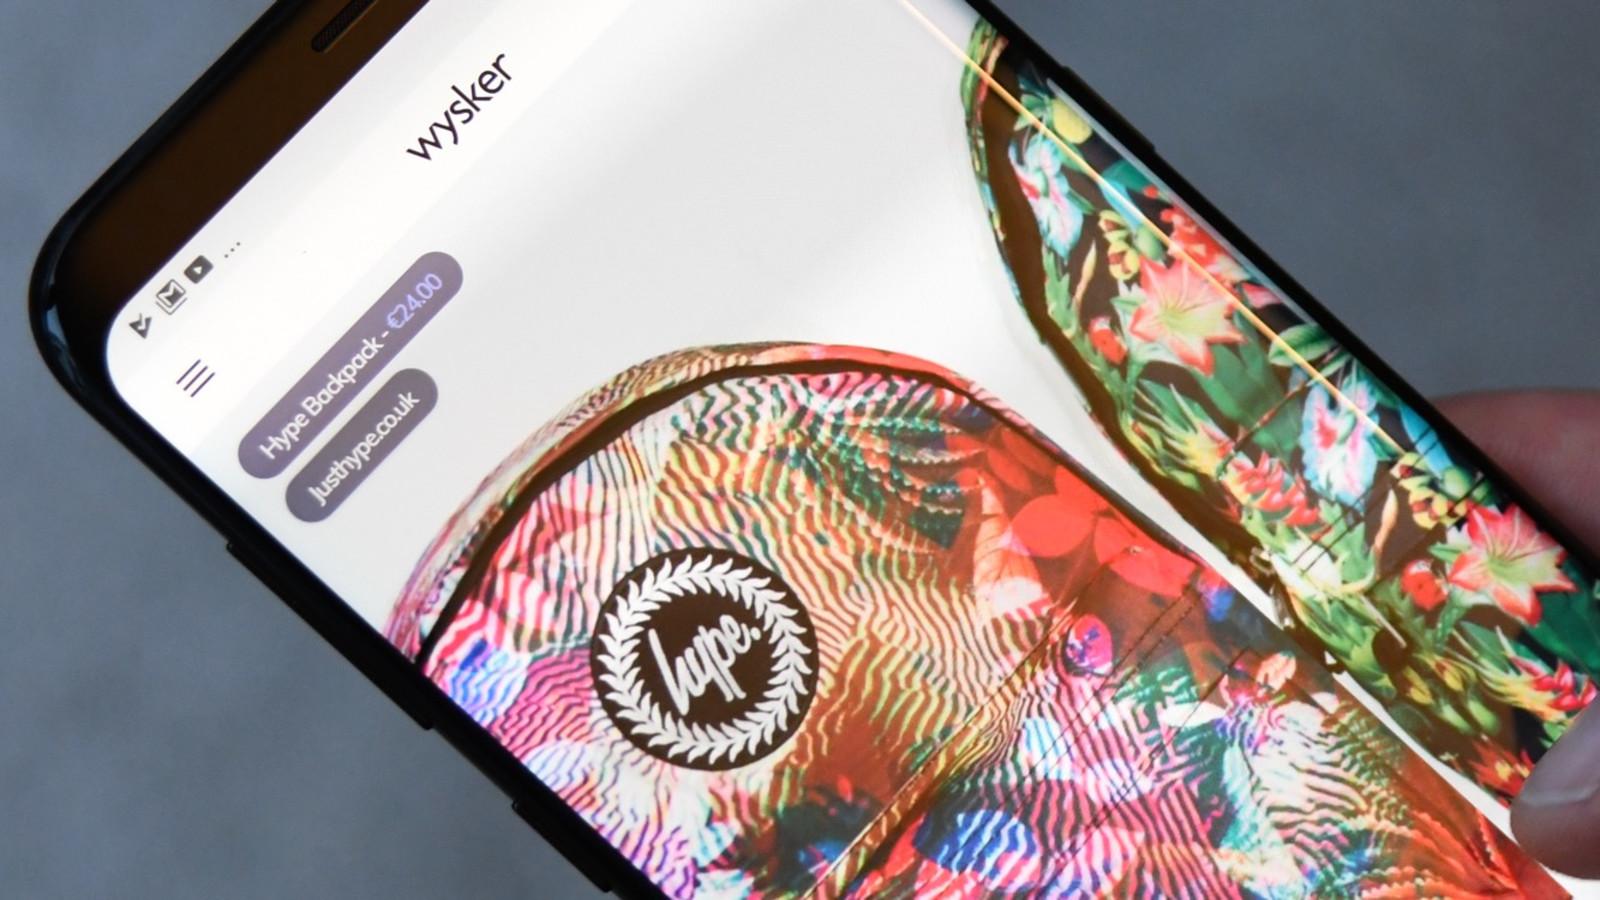 Wysker app close-up